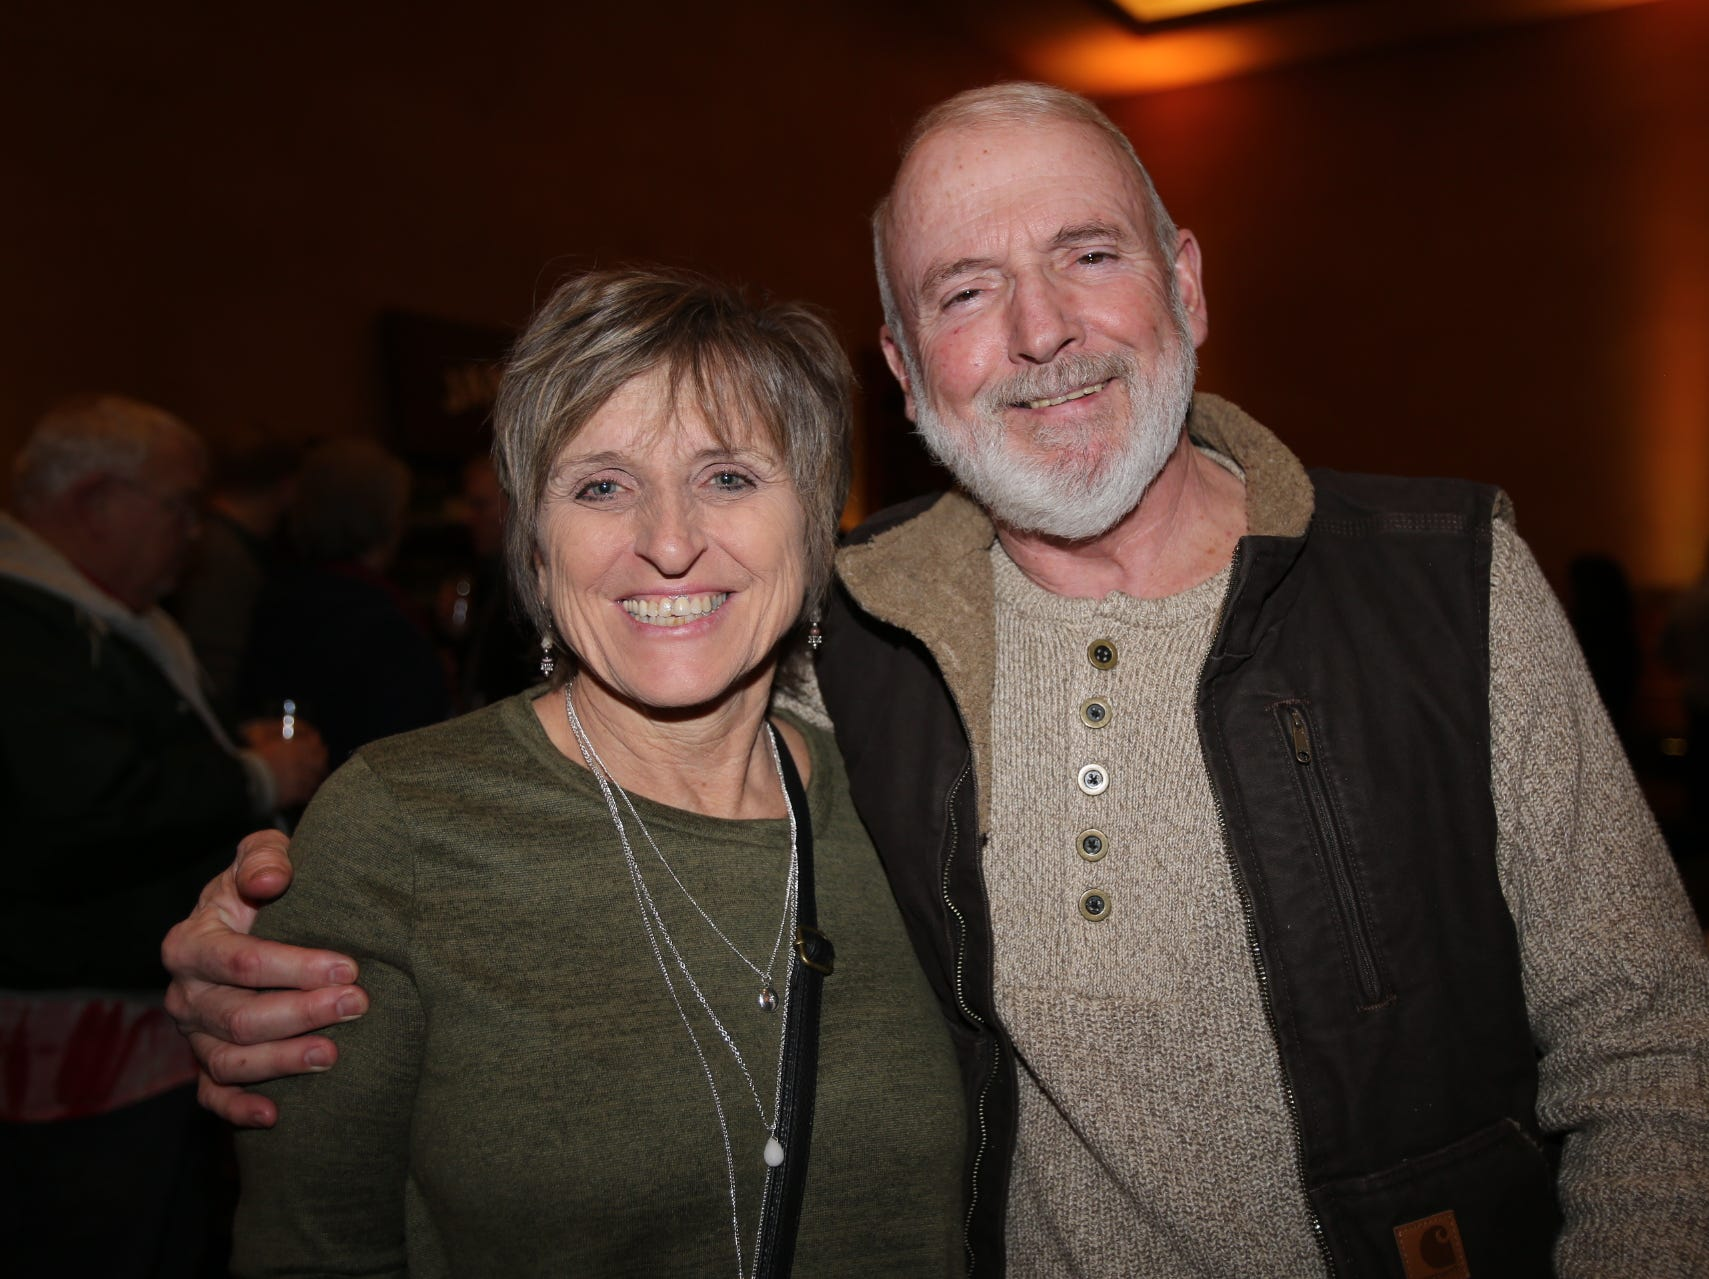 Judy McWilliams and Dan Earnest